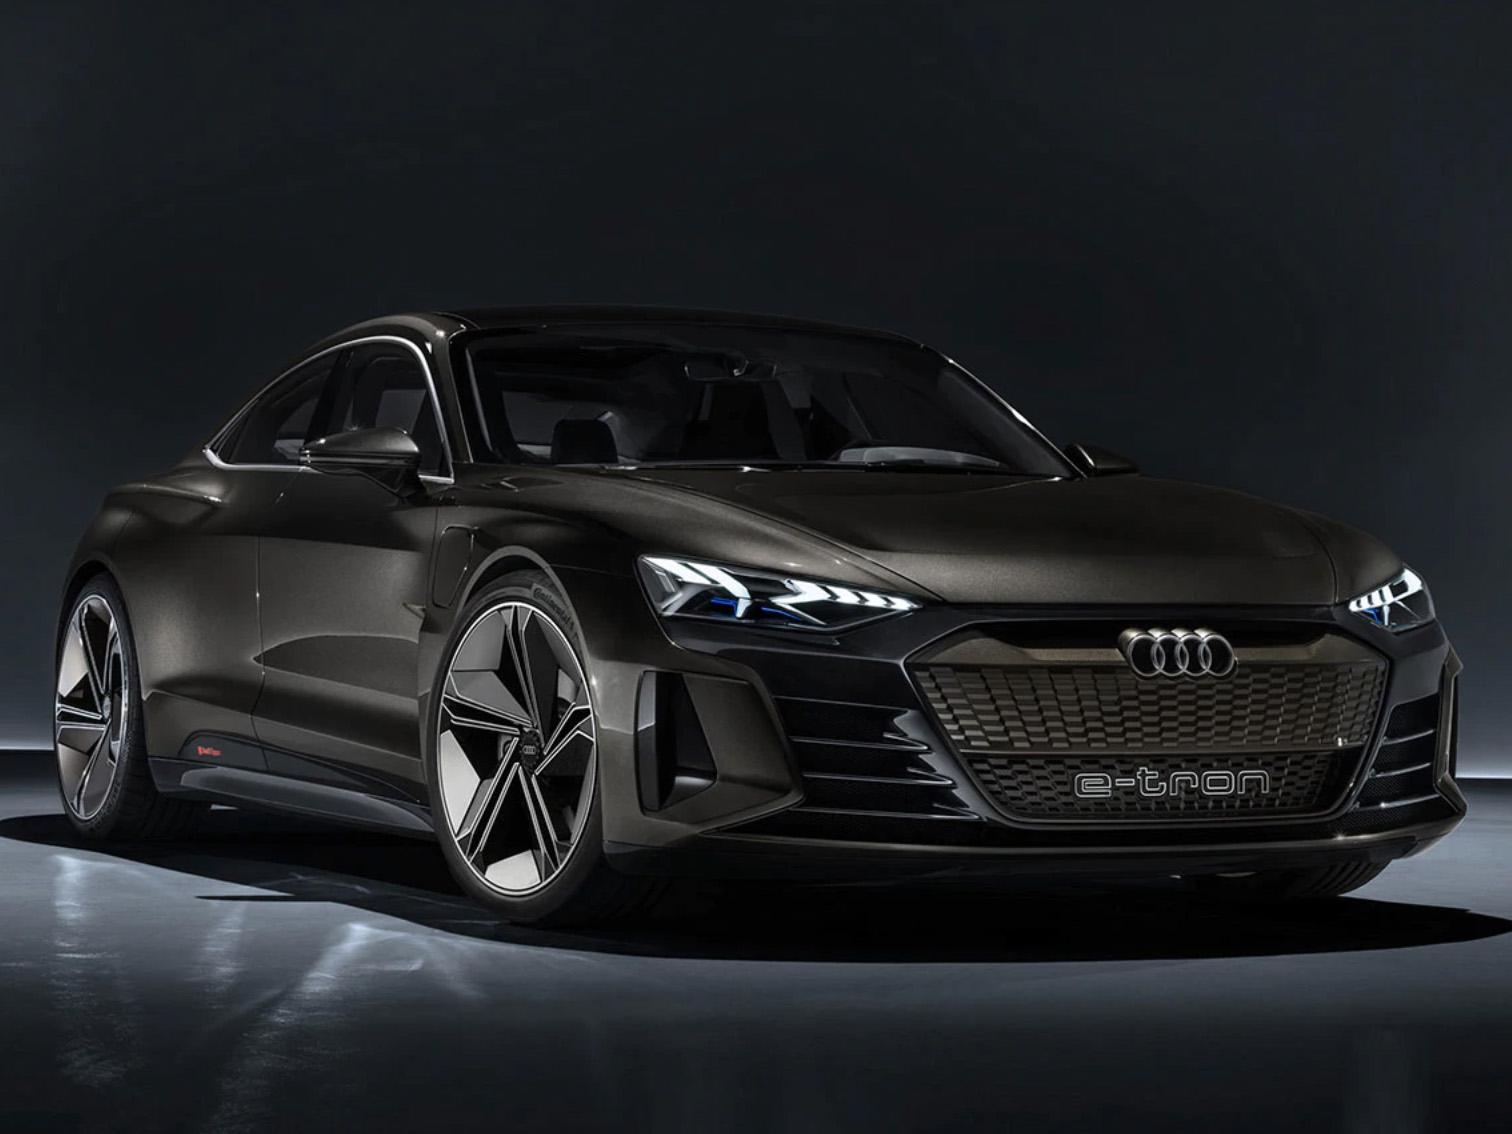 Audi e-tron GT Concept,量產預計 2020 年底開始。